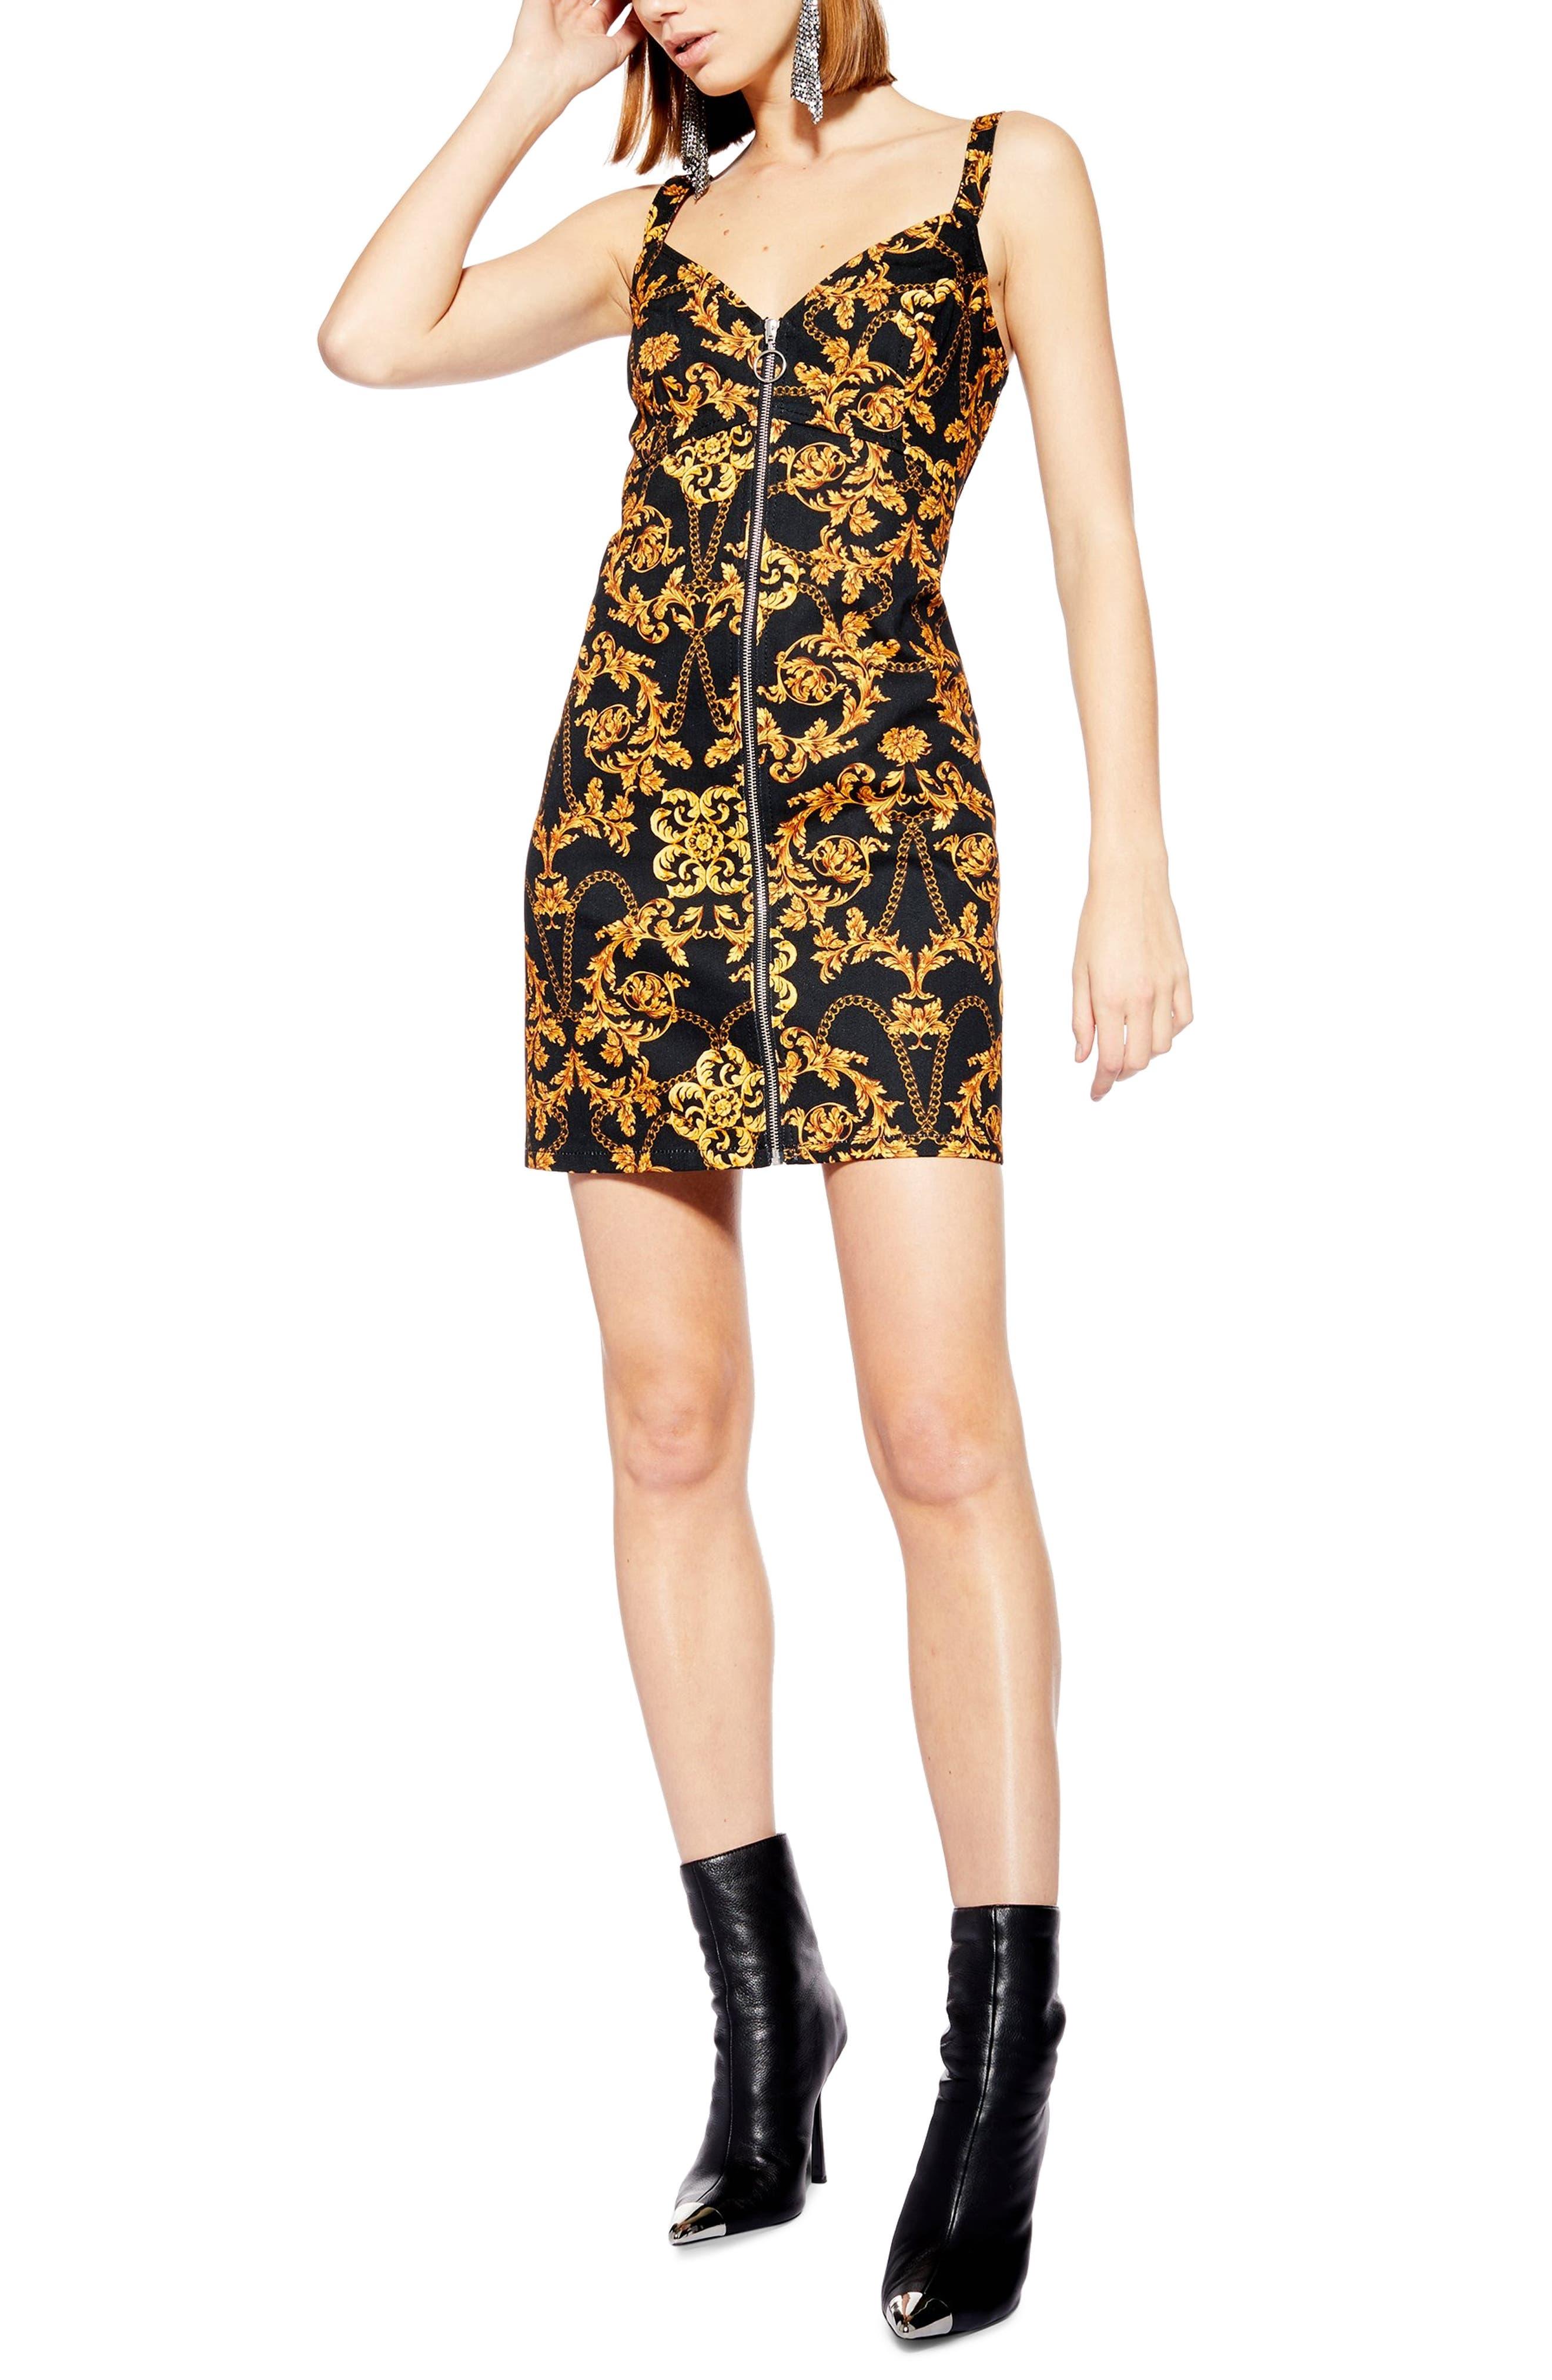 Topshop Chain Print Denim Dress, US (fits like 0) - Black